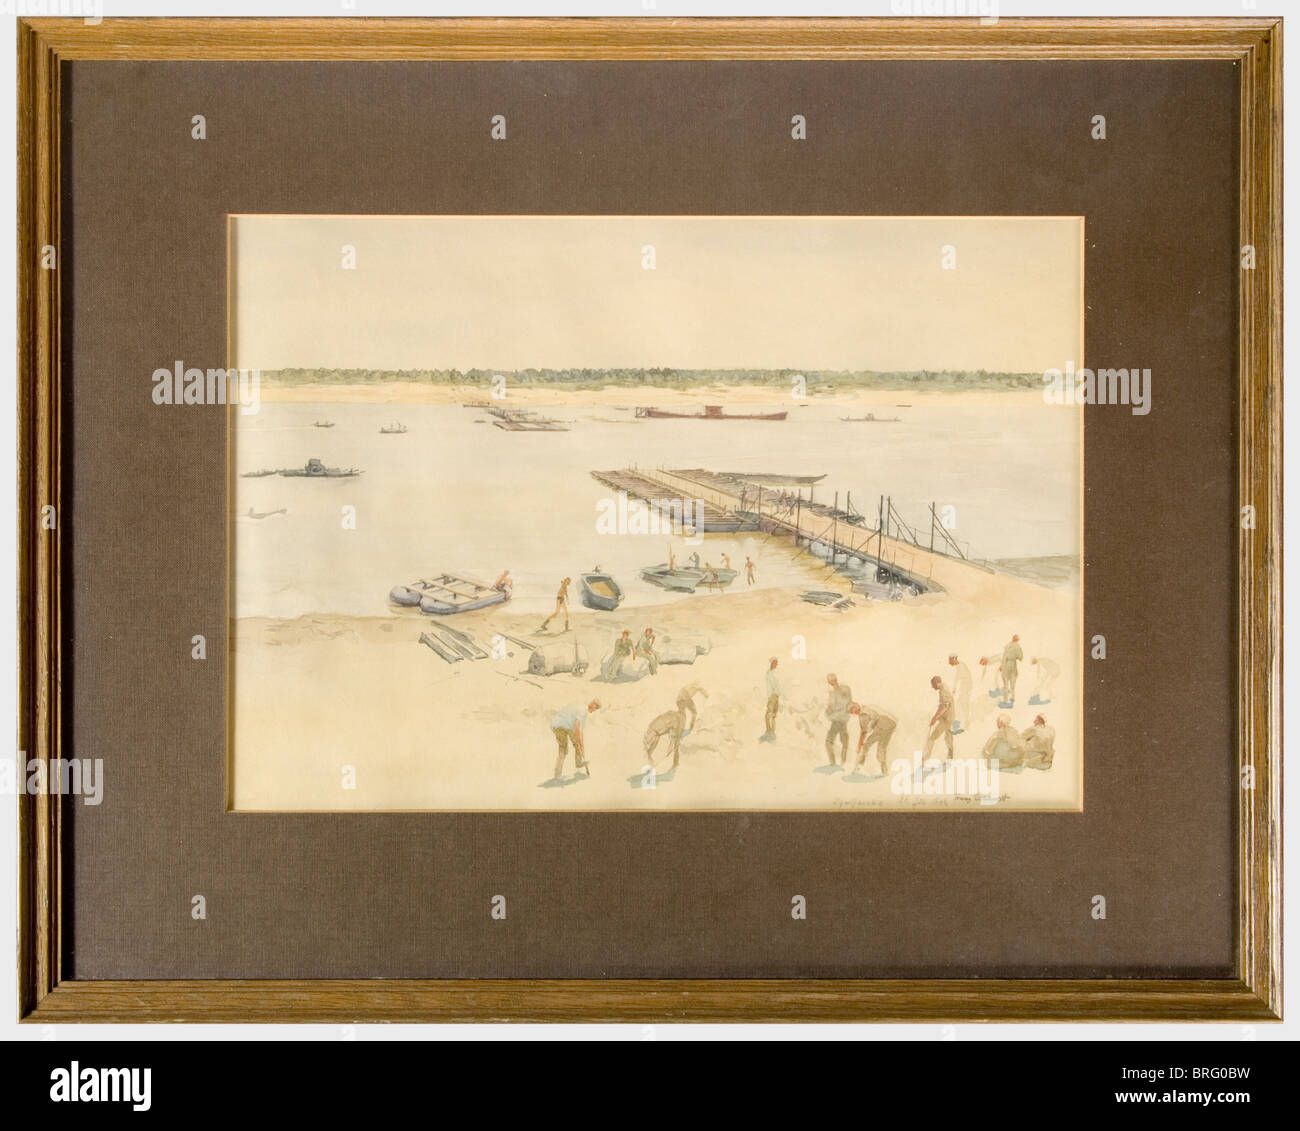 Franz Eichhorst (1885 - 1948), Zymljanska Large-format watercolour study. Signed, dated and titled 'Franz Eichhorst - Stock Image